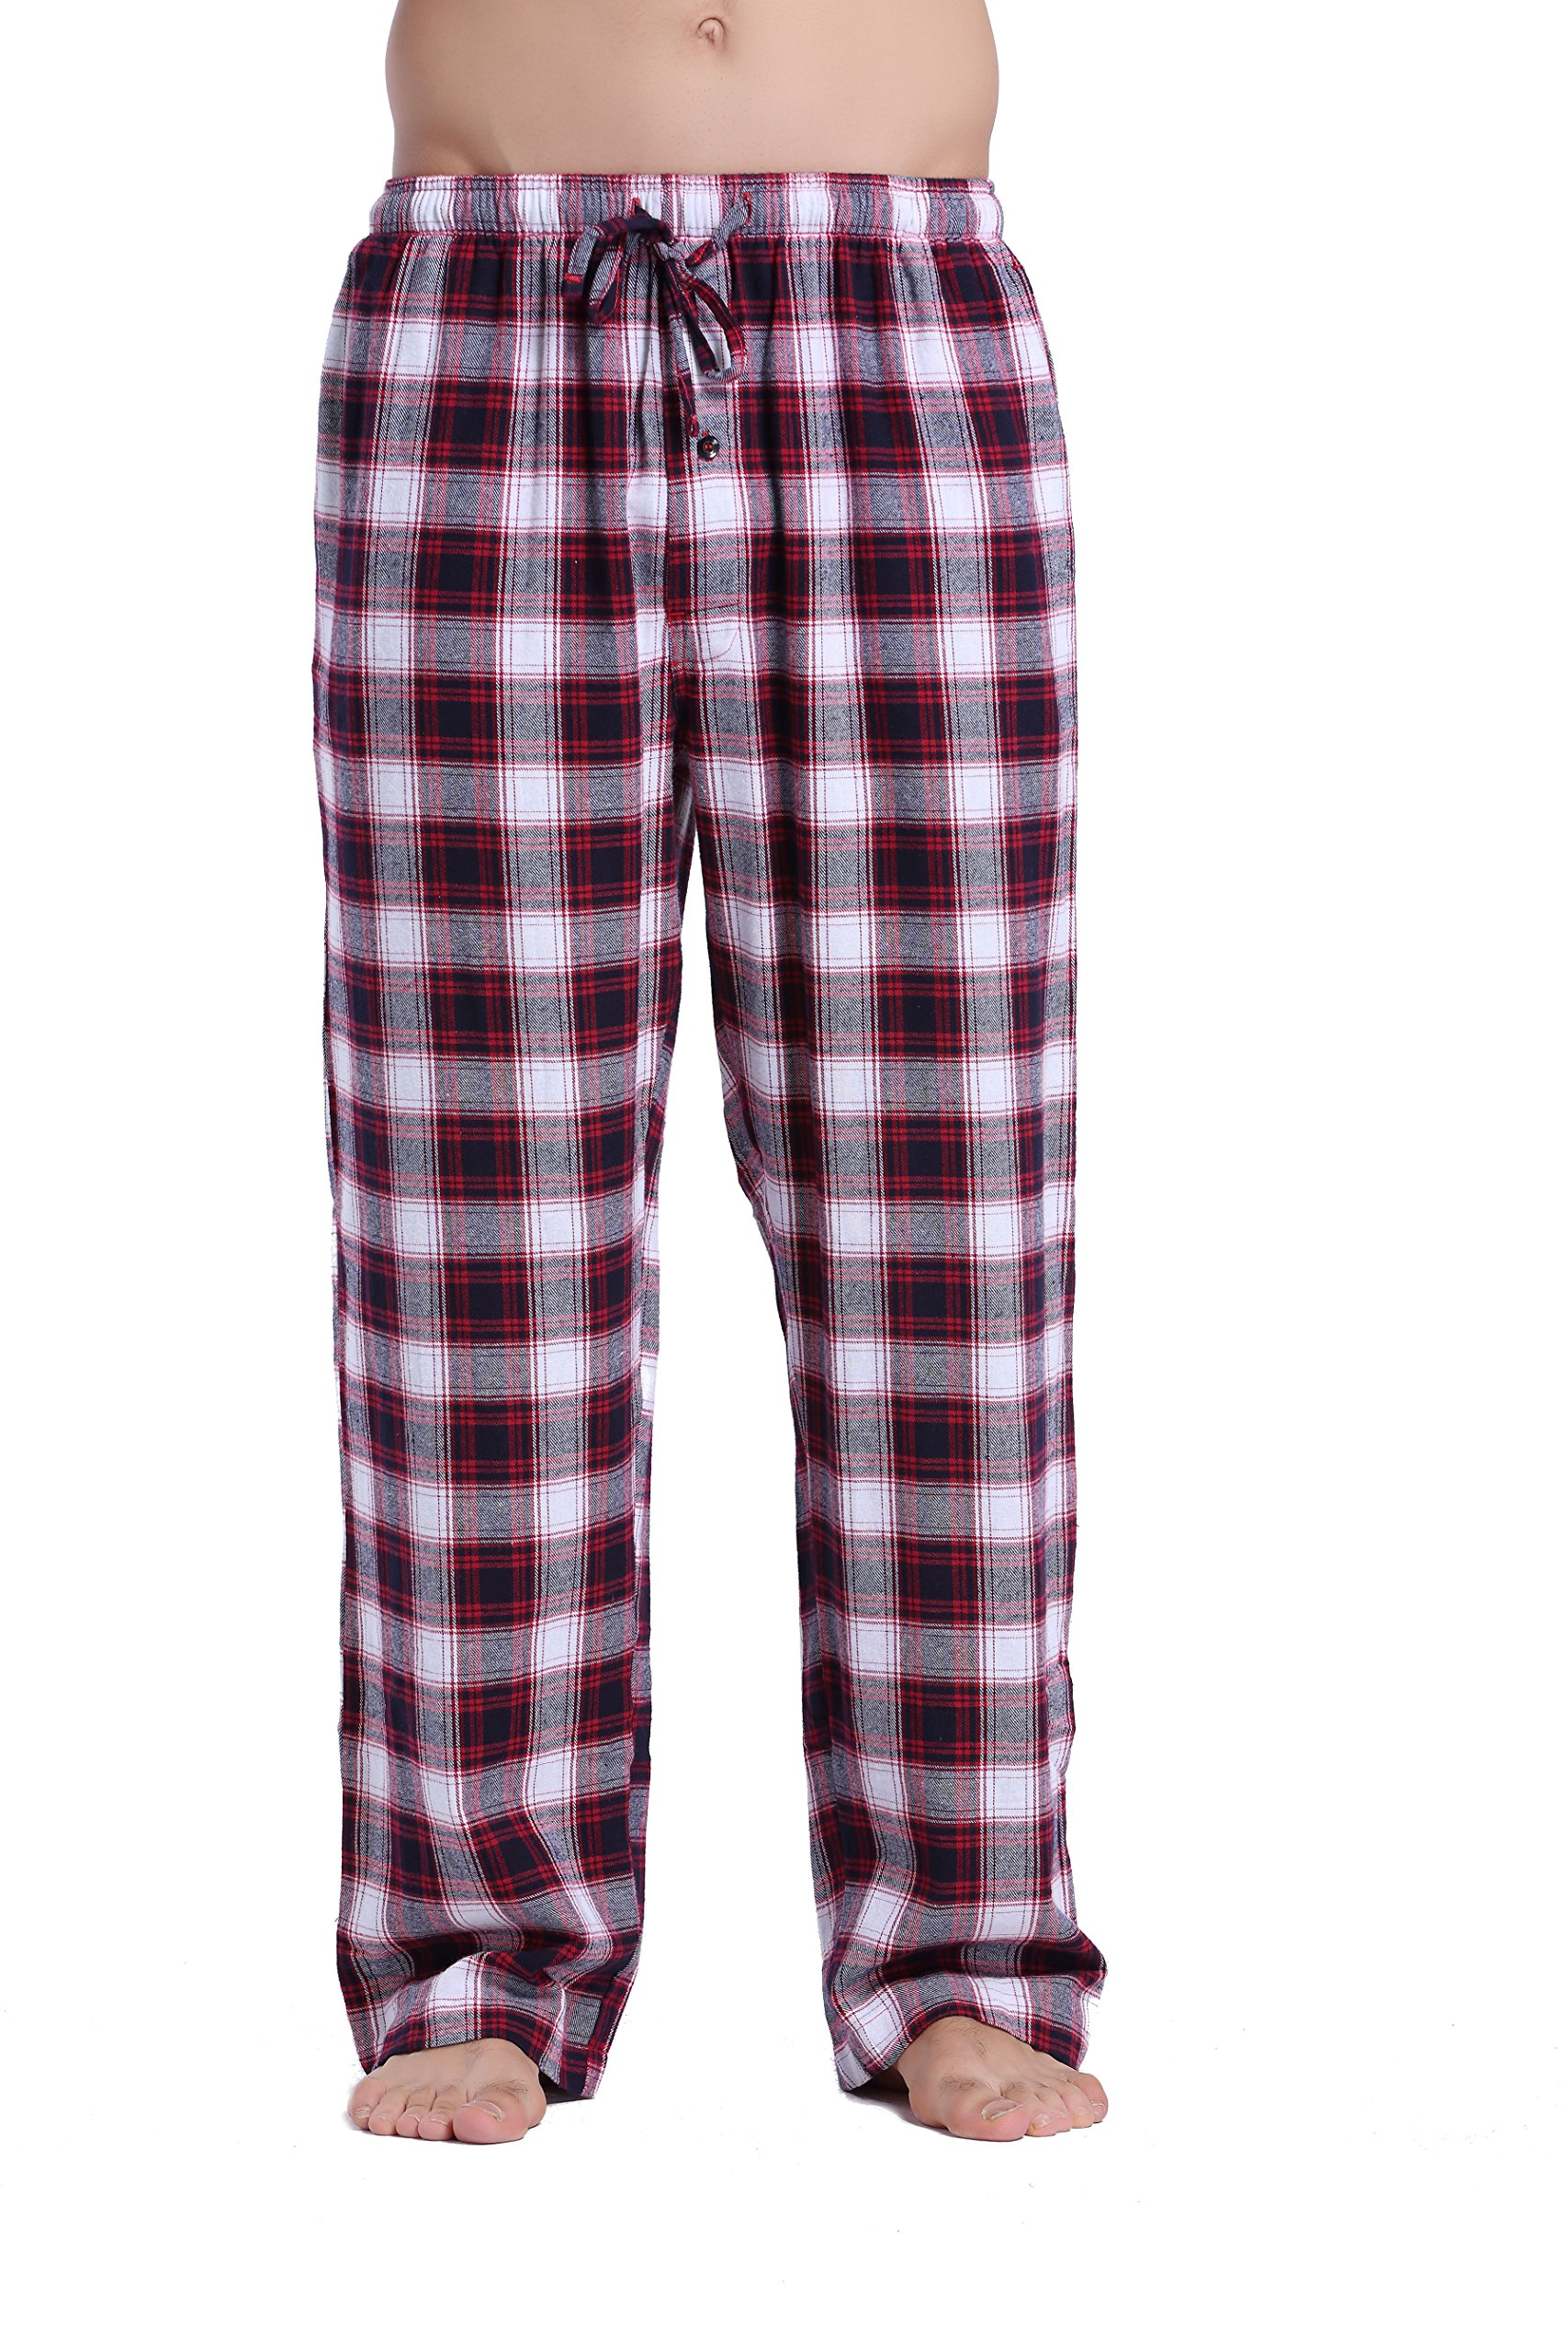 CYZ Men's 100% Cotton Super Soft Flannel Plaid Pajama Pants-WhiteRedNavy-M by CYZ Collection